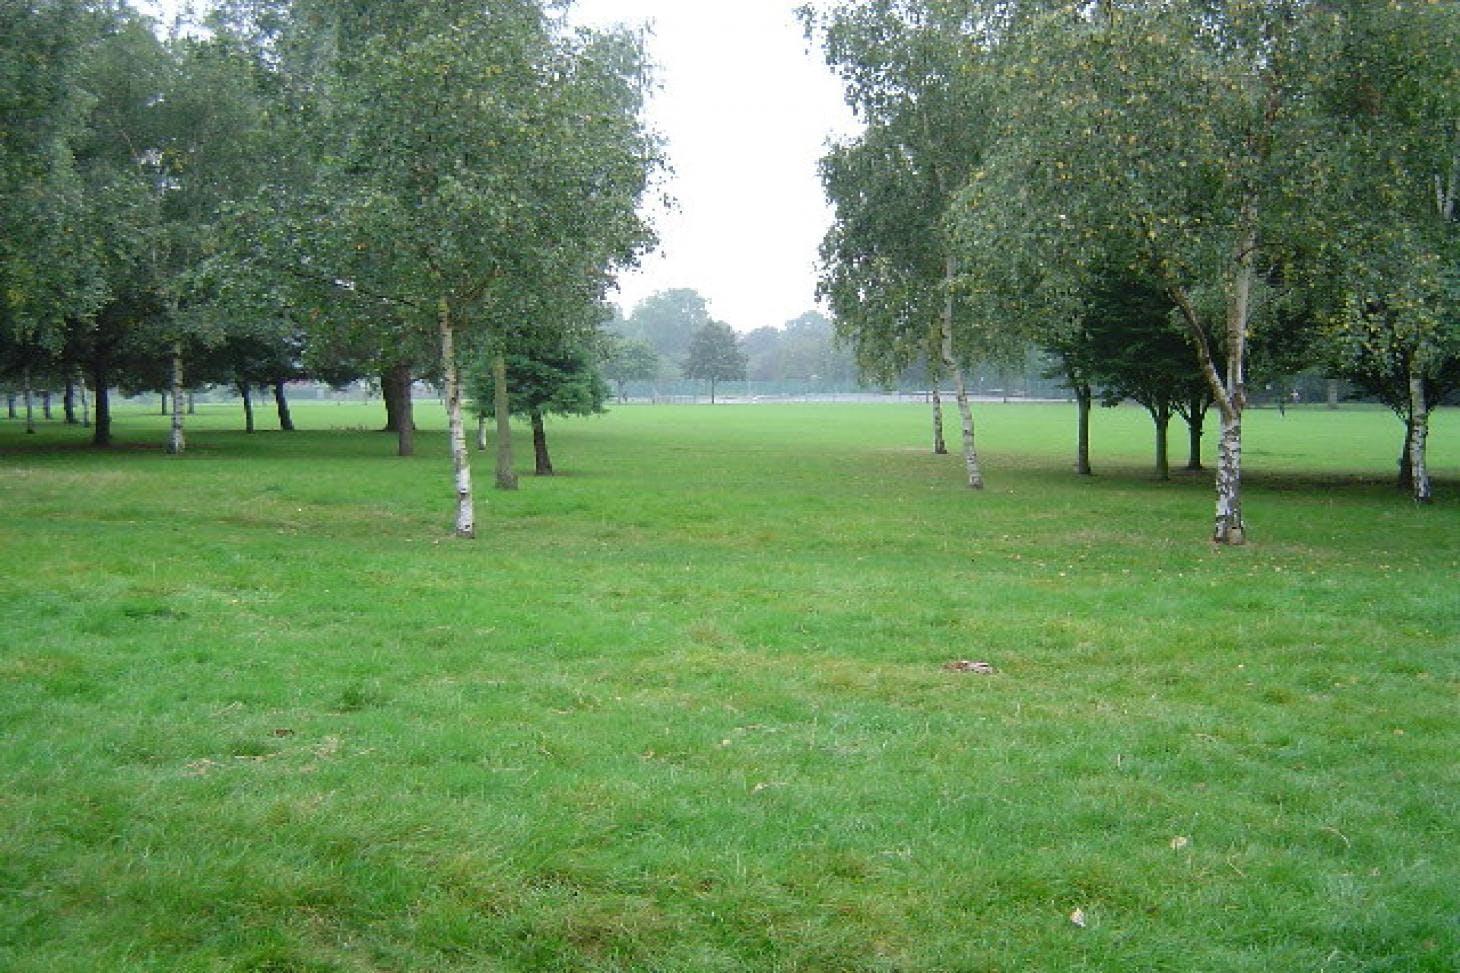 Harrow Recreation Ground Outdoor | Hard (macadam) tennis court